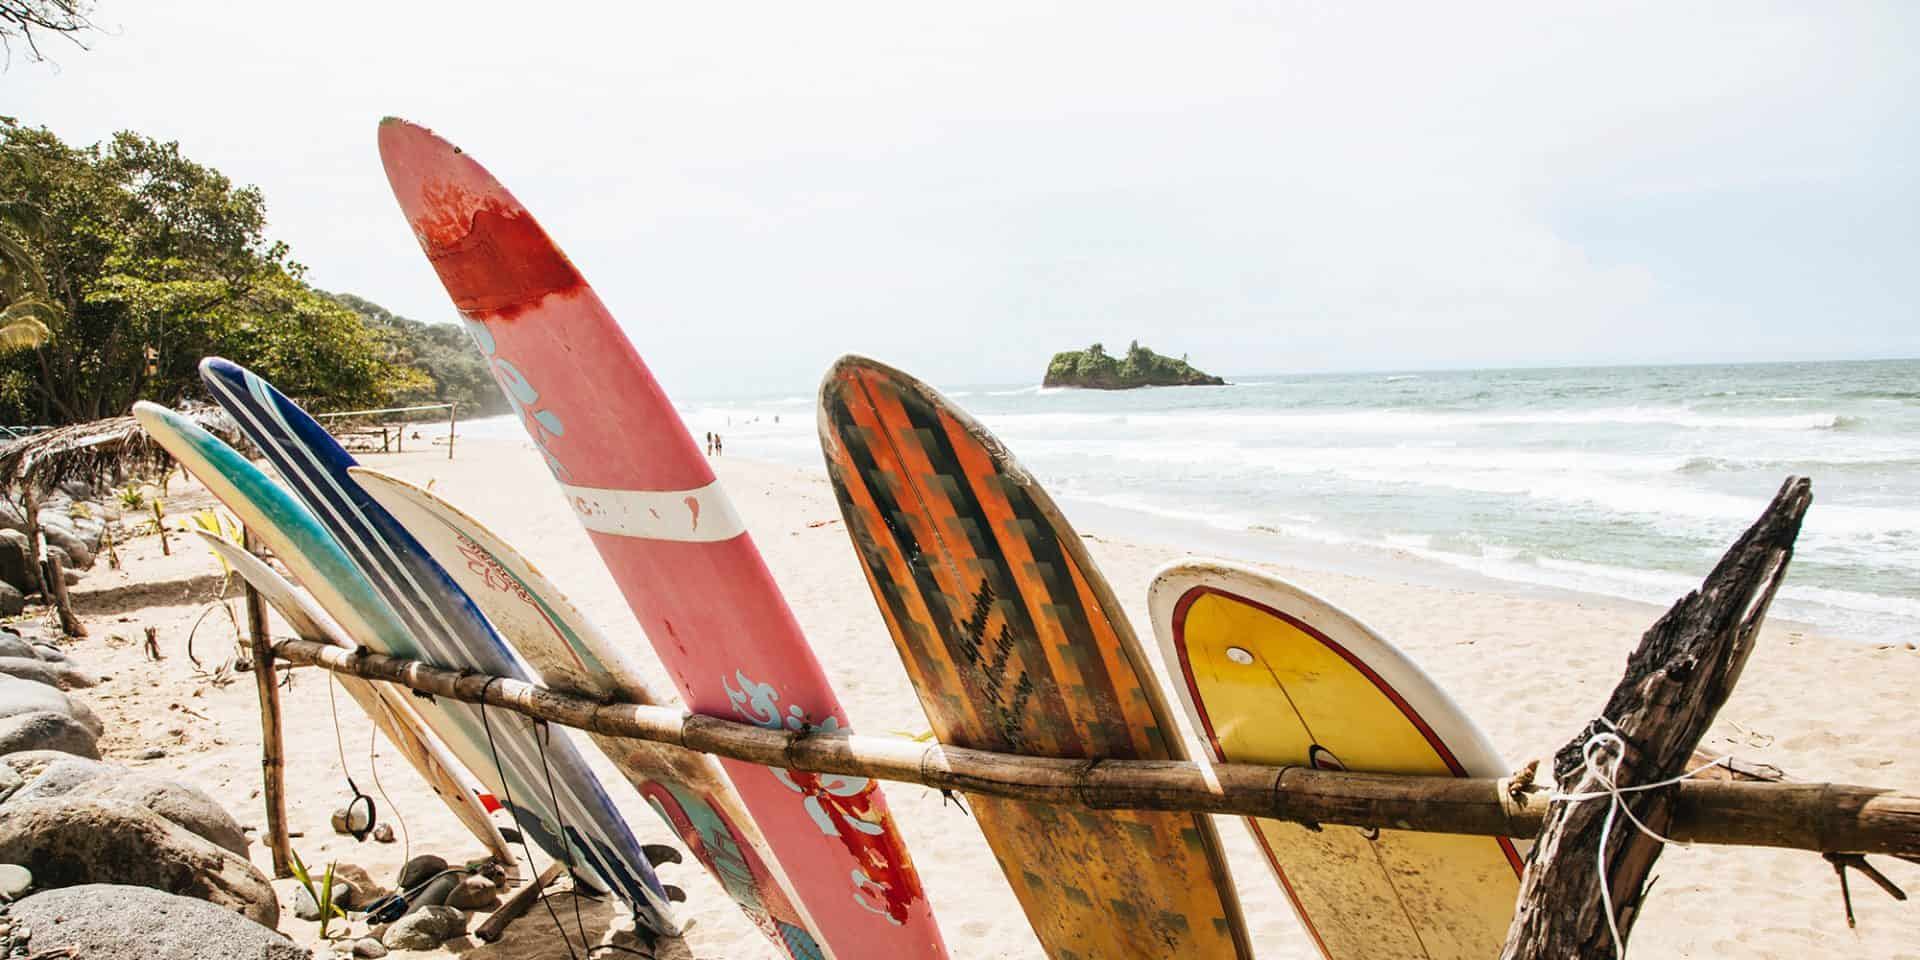 best beginner surfboard to buy guide softtop longboard mini mal shortboard volume tips